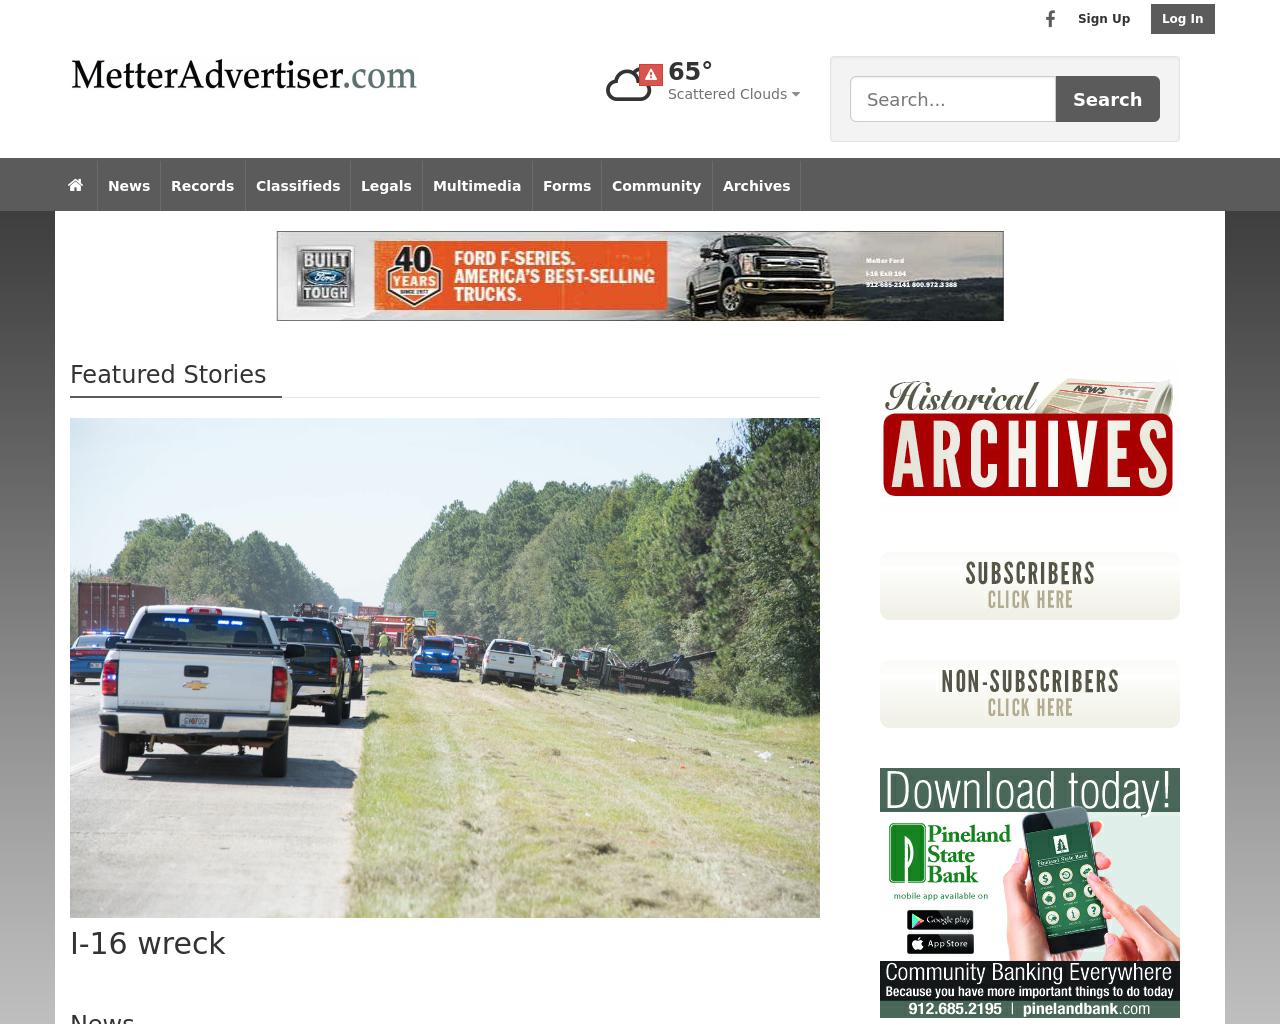 MetterAdvertiser.com-Advertising-Reviews-Pricing